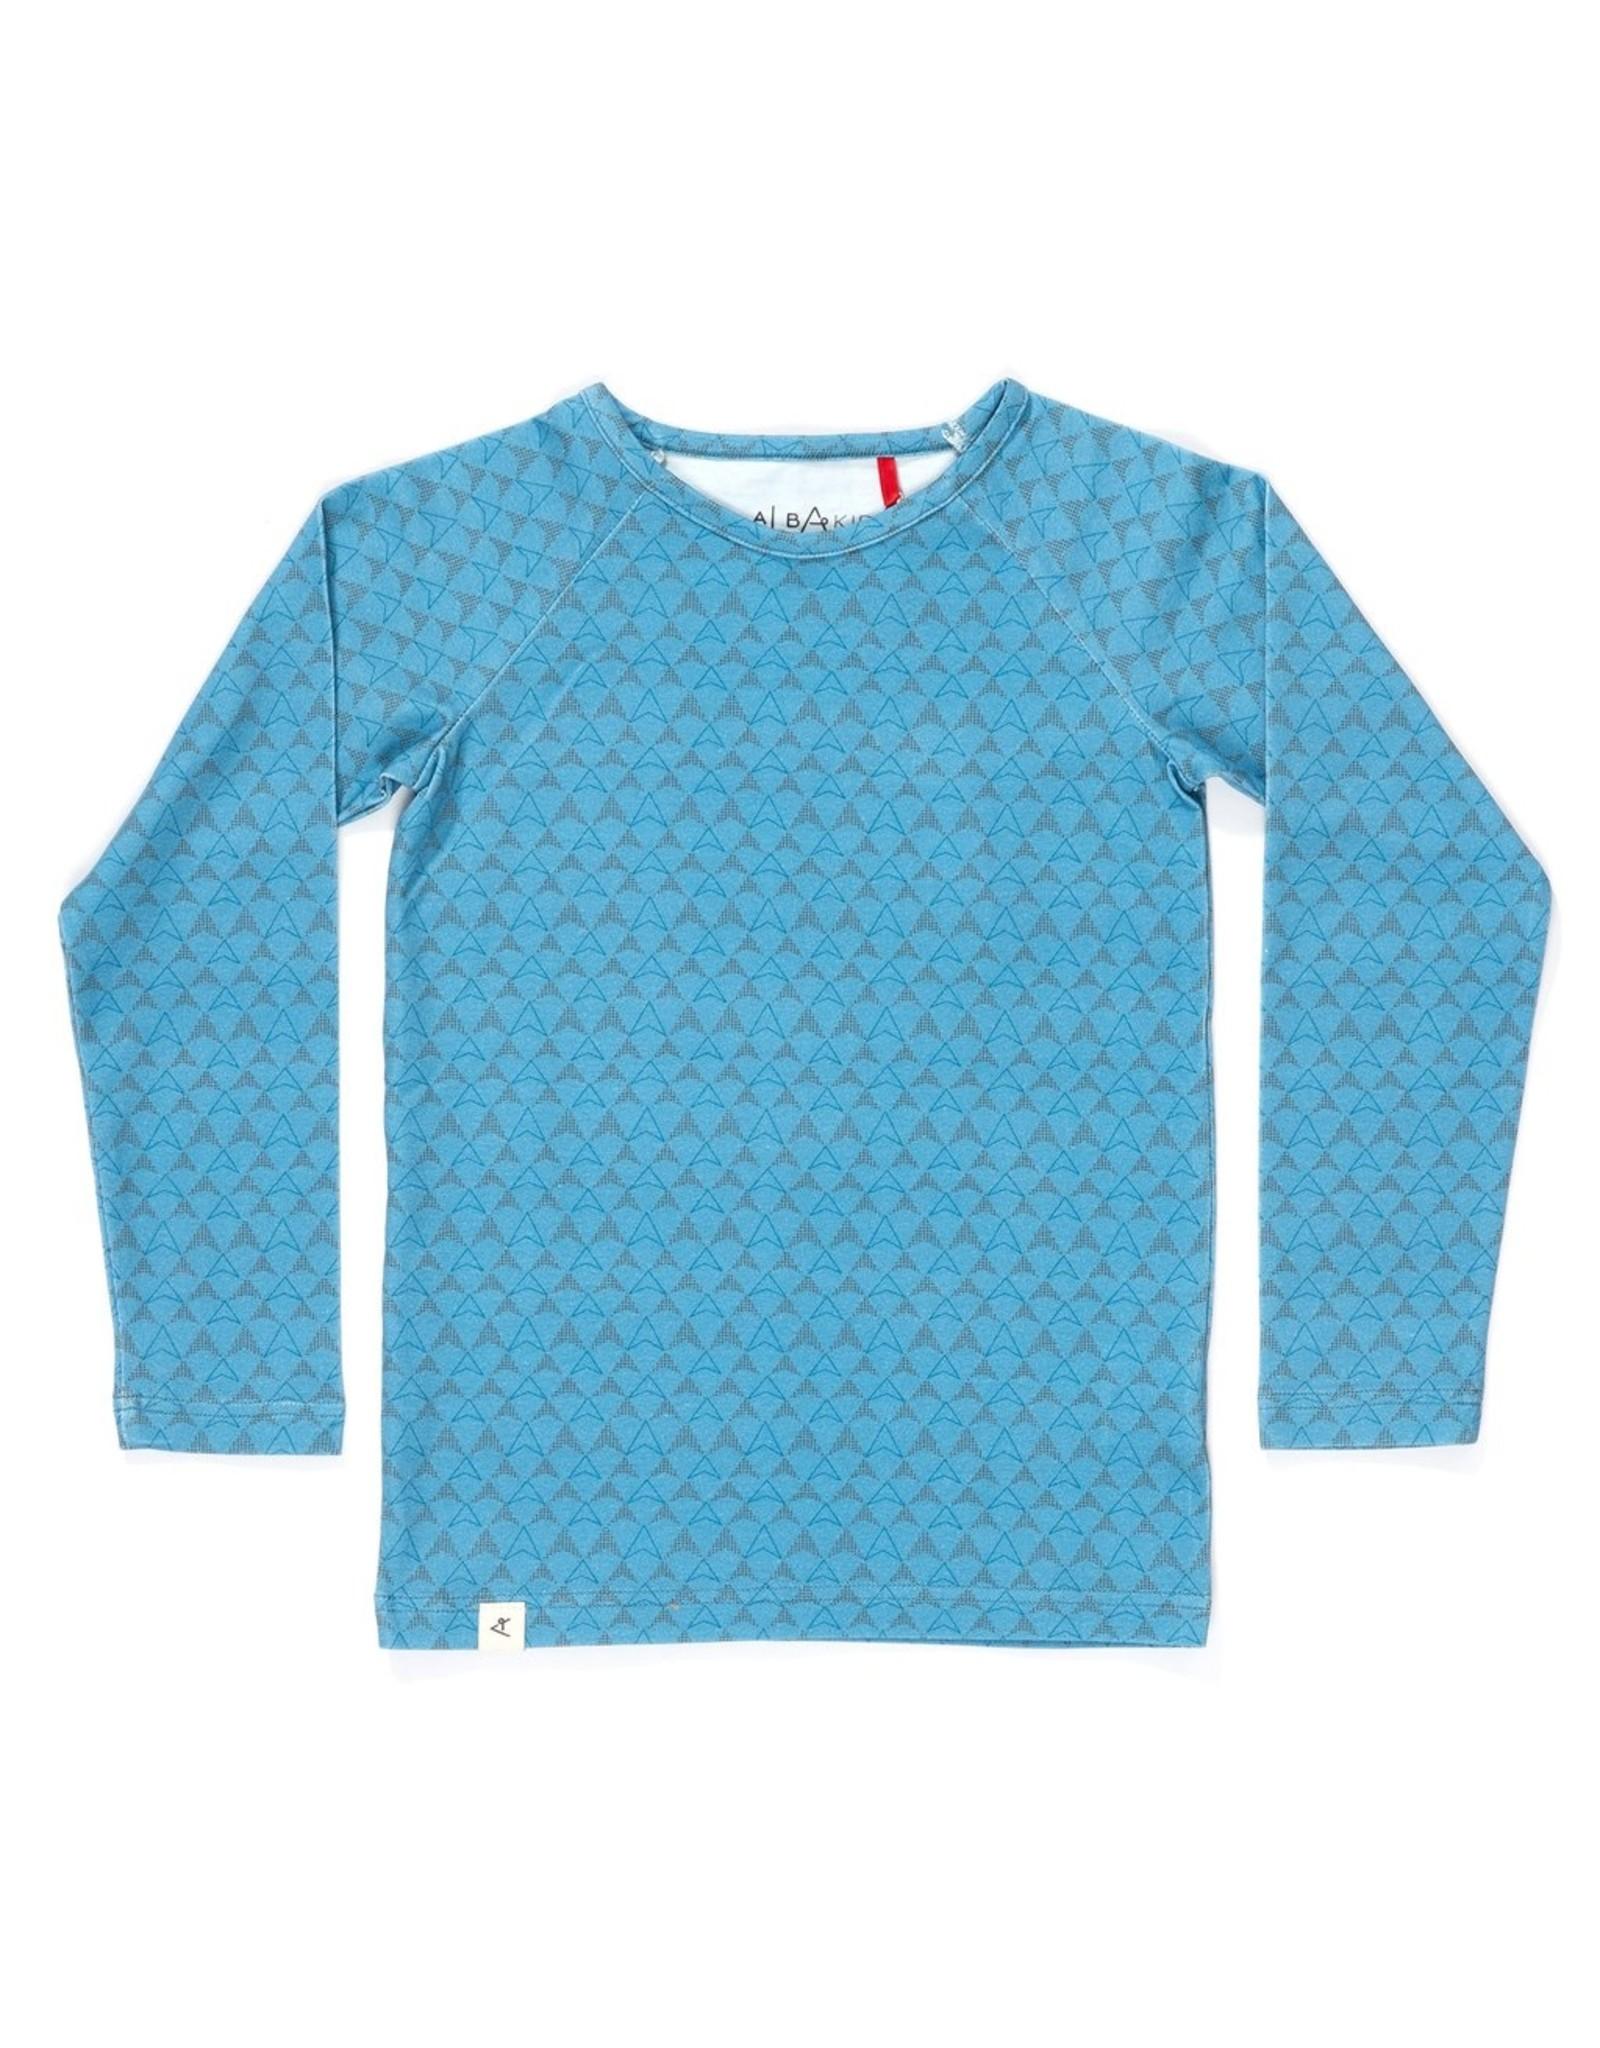 Albababy Alba kinder blouse - hannibal blouse blue